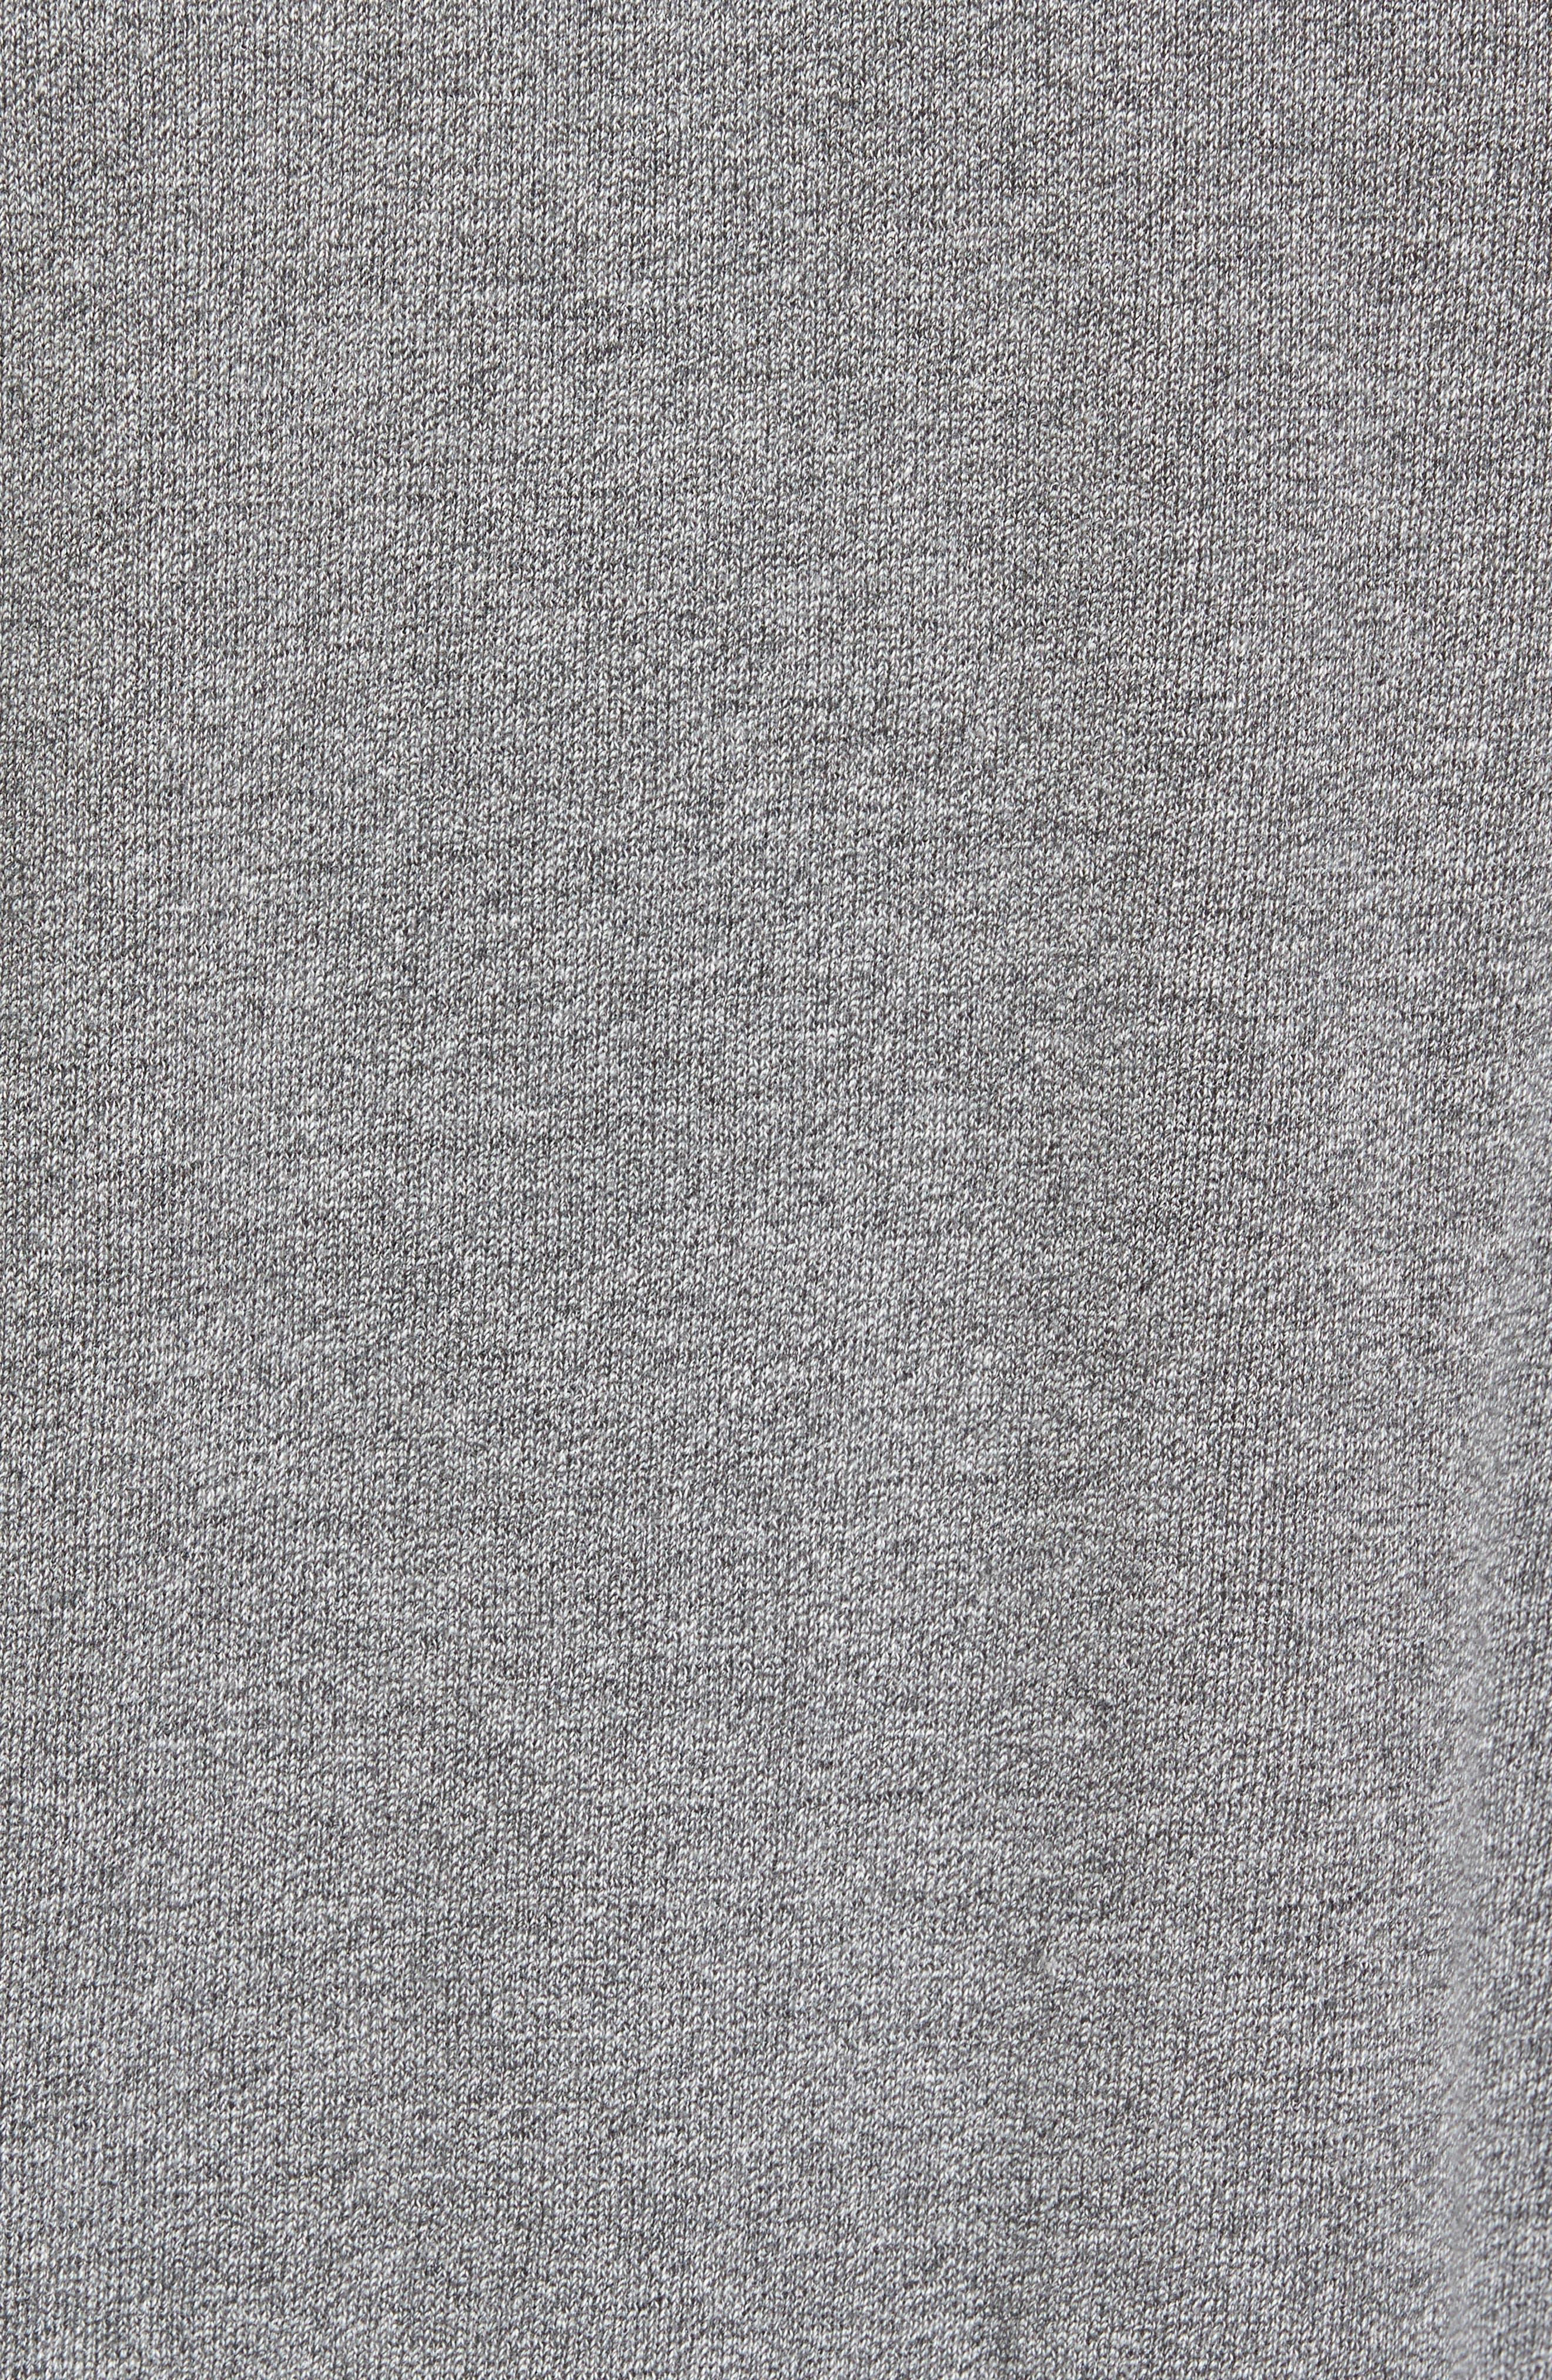 NFL Stitch of Liberty Embroidered Crewneck Sweatshirt,                             Alternate thumbnail 143, color,